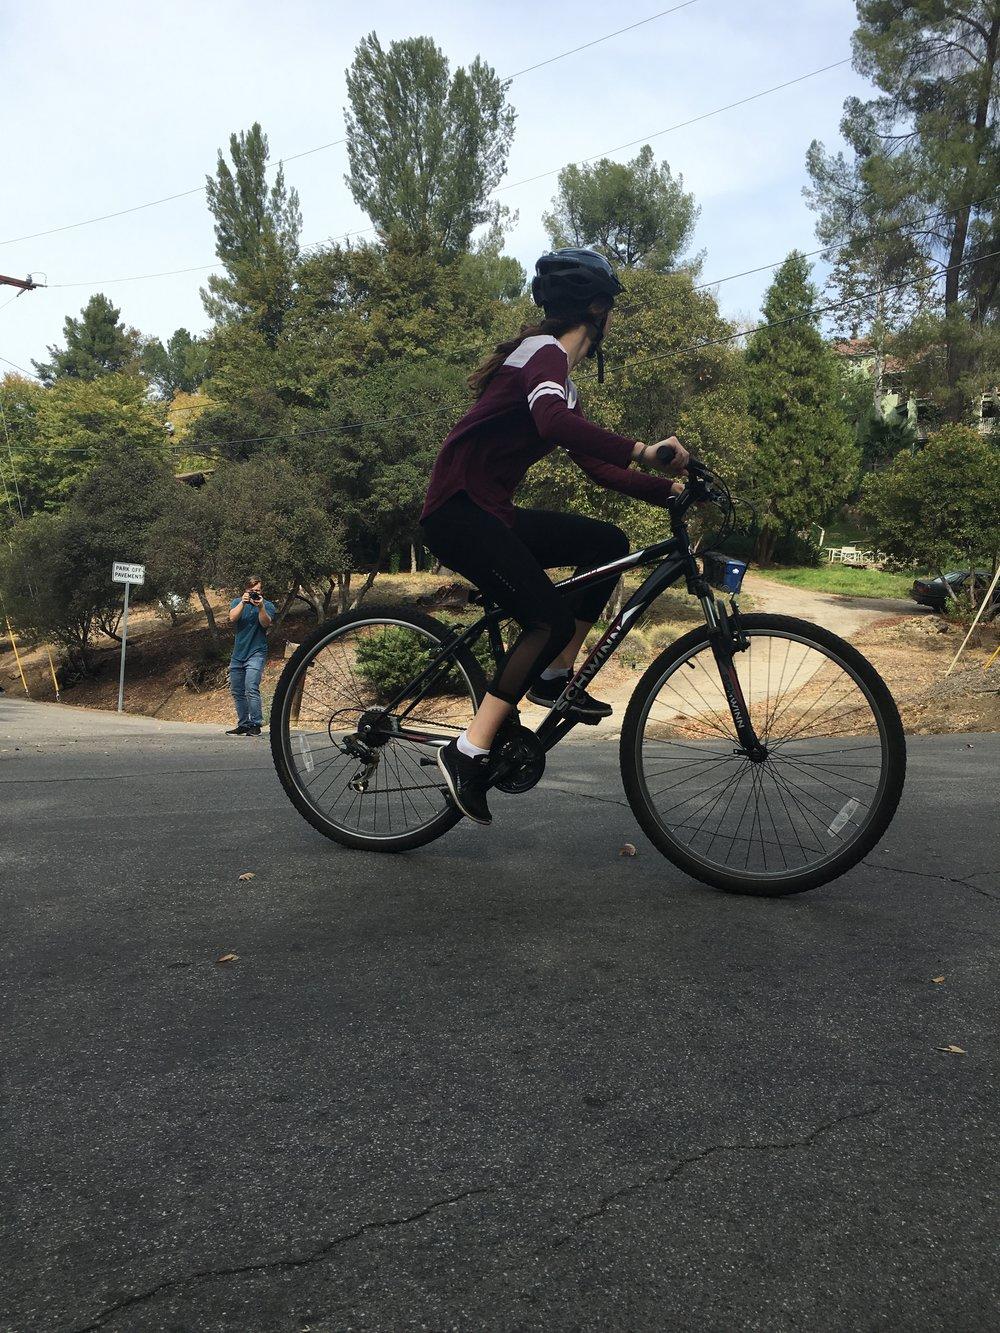 Collaboration with Andrew Jackson showing Kiara's mountain biking skills.